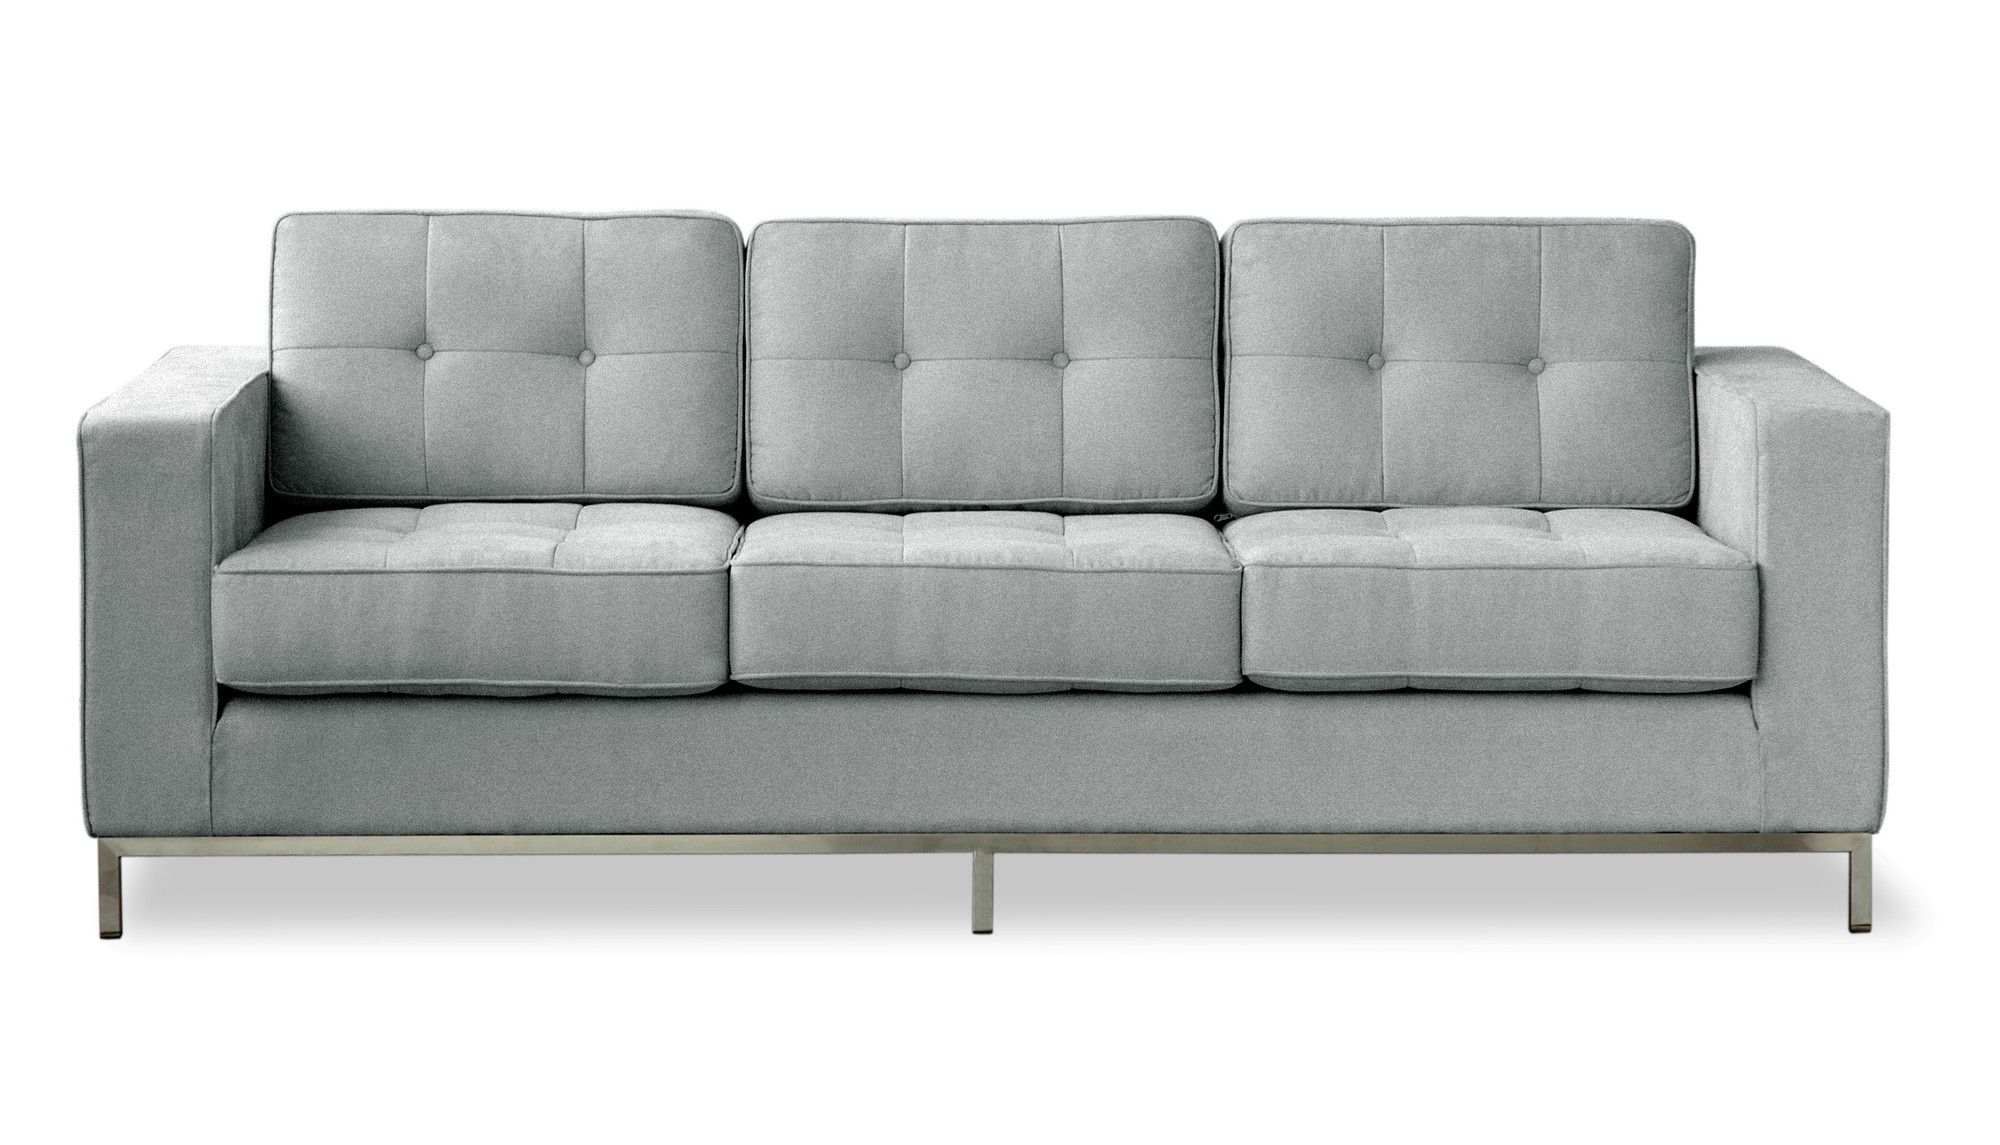 Incredible Gus Modern Jane Sofa Allmodern Ballroom Modern Couch Squirreltailoven Fun Painted Chair Ideas Images Squirreltailovenorg